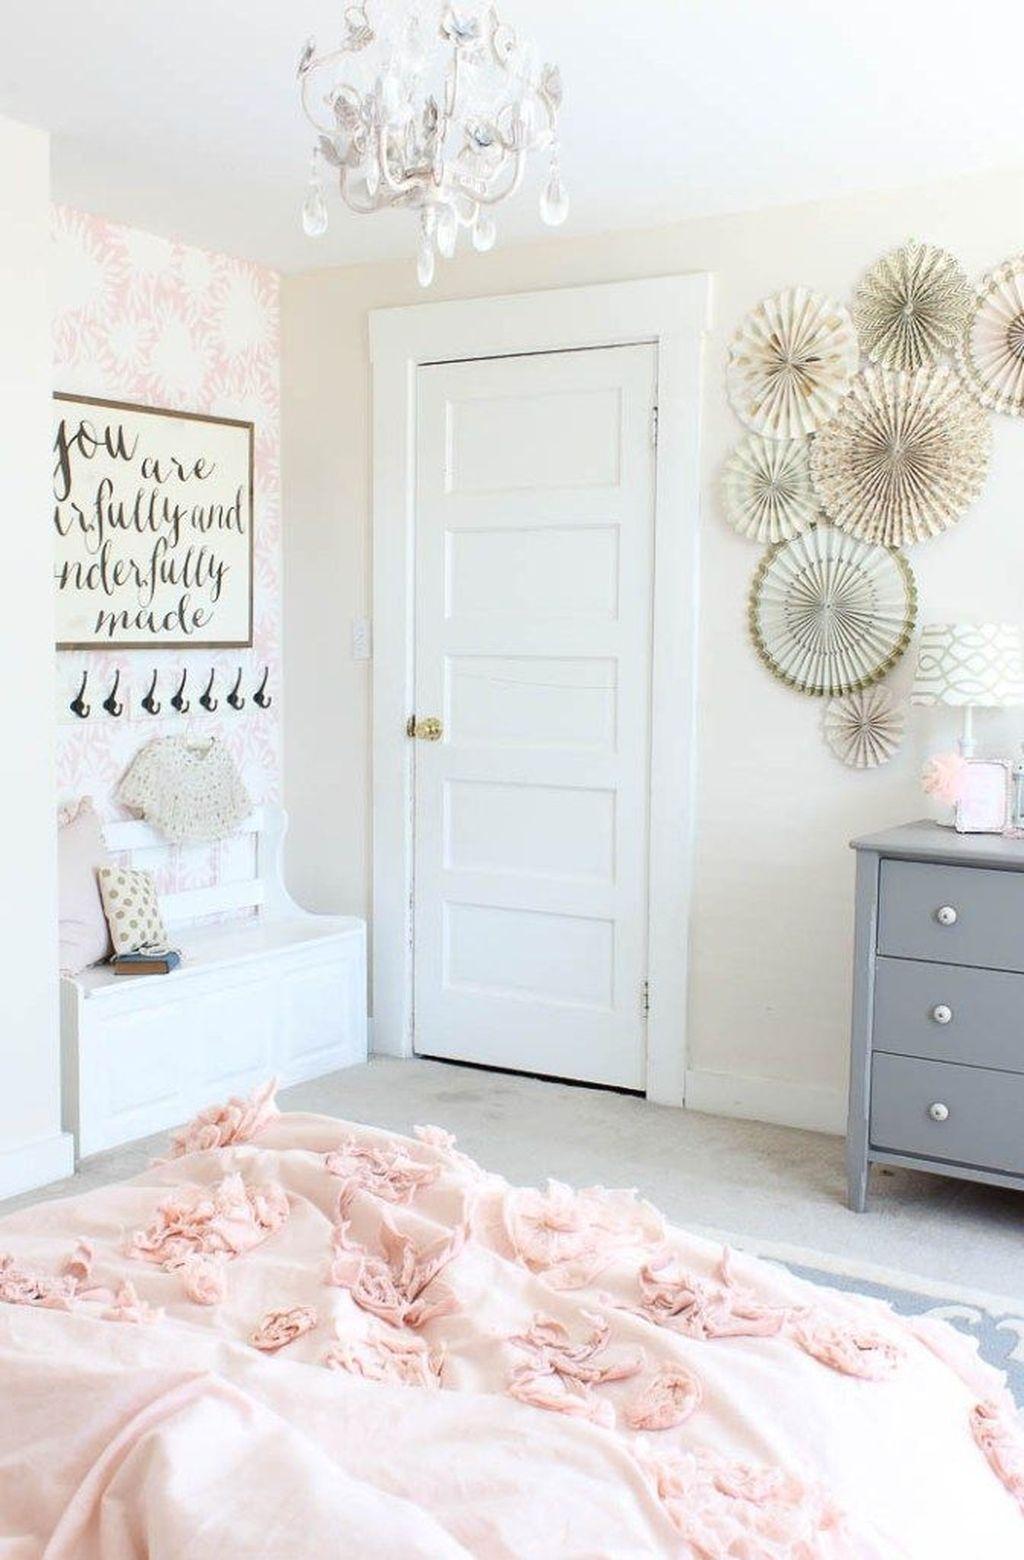 39 Wonderful Girls Room Design Ideas21